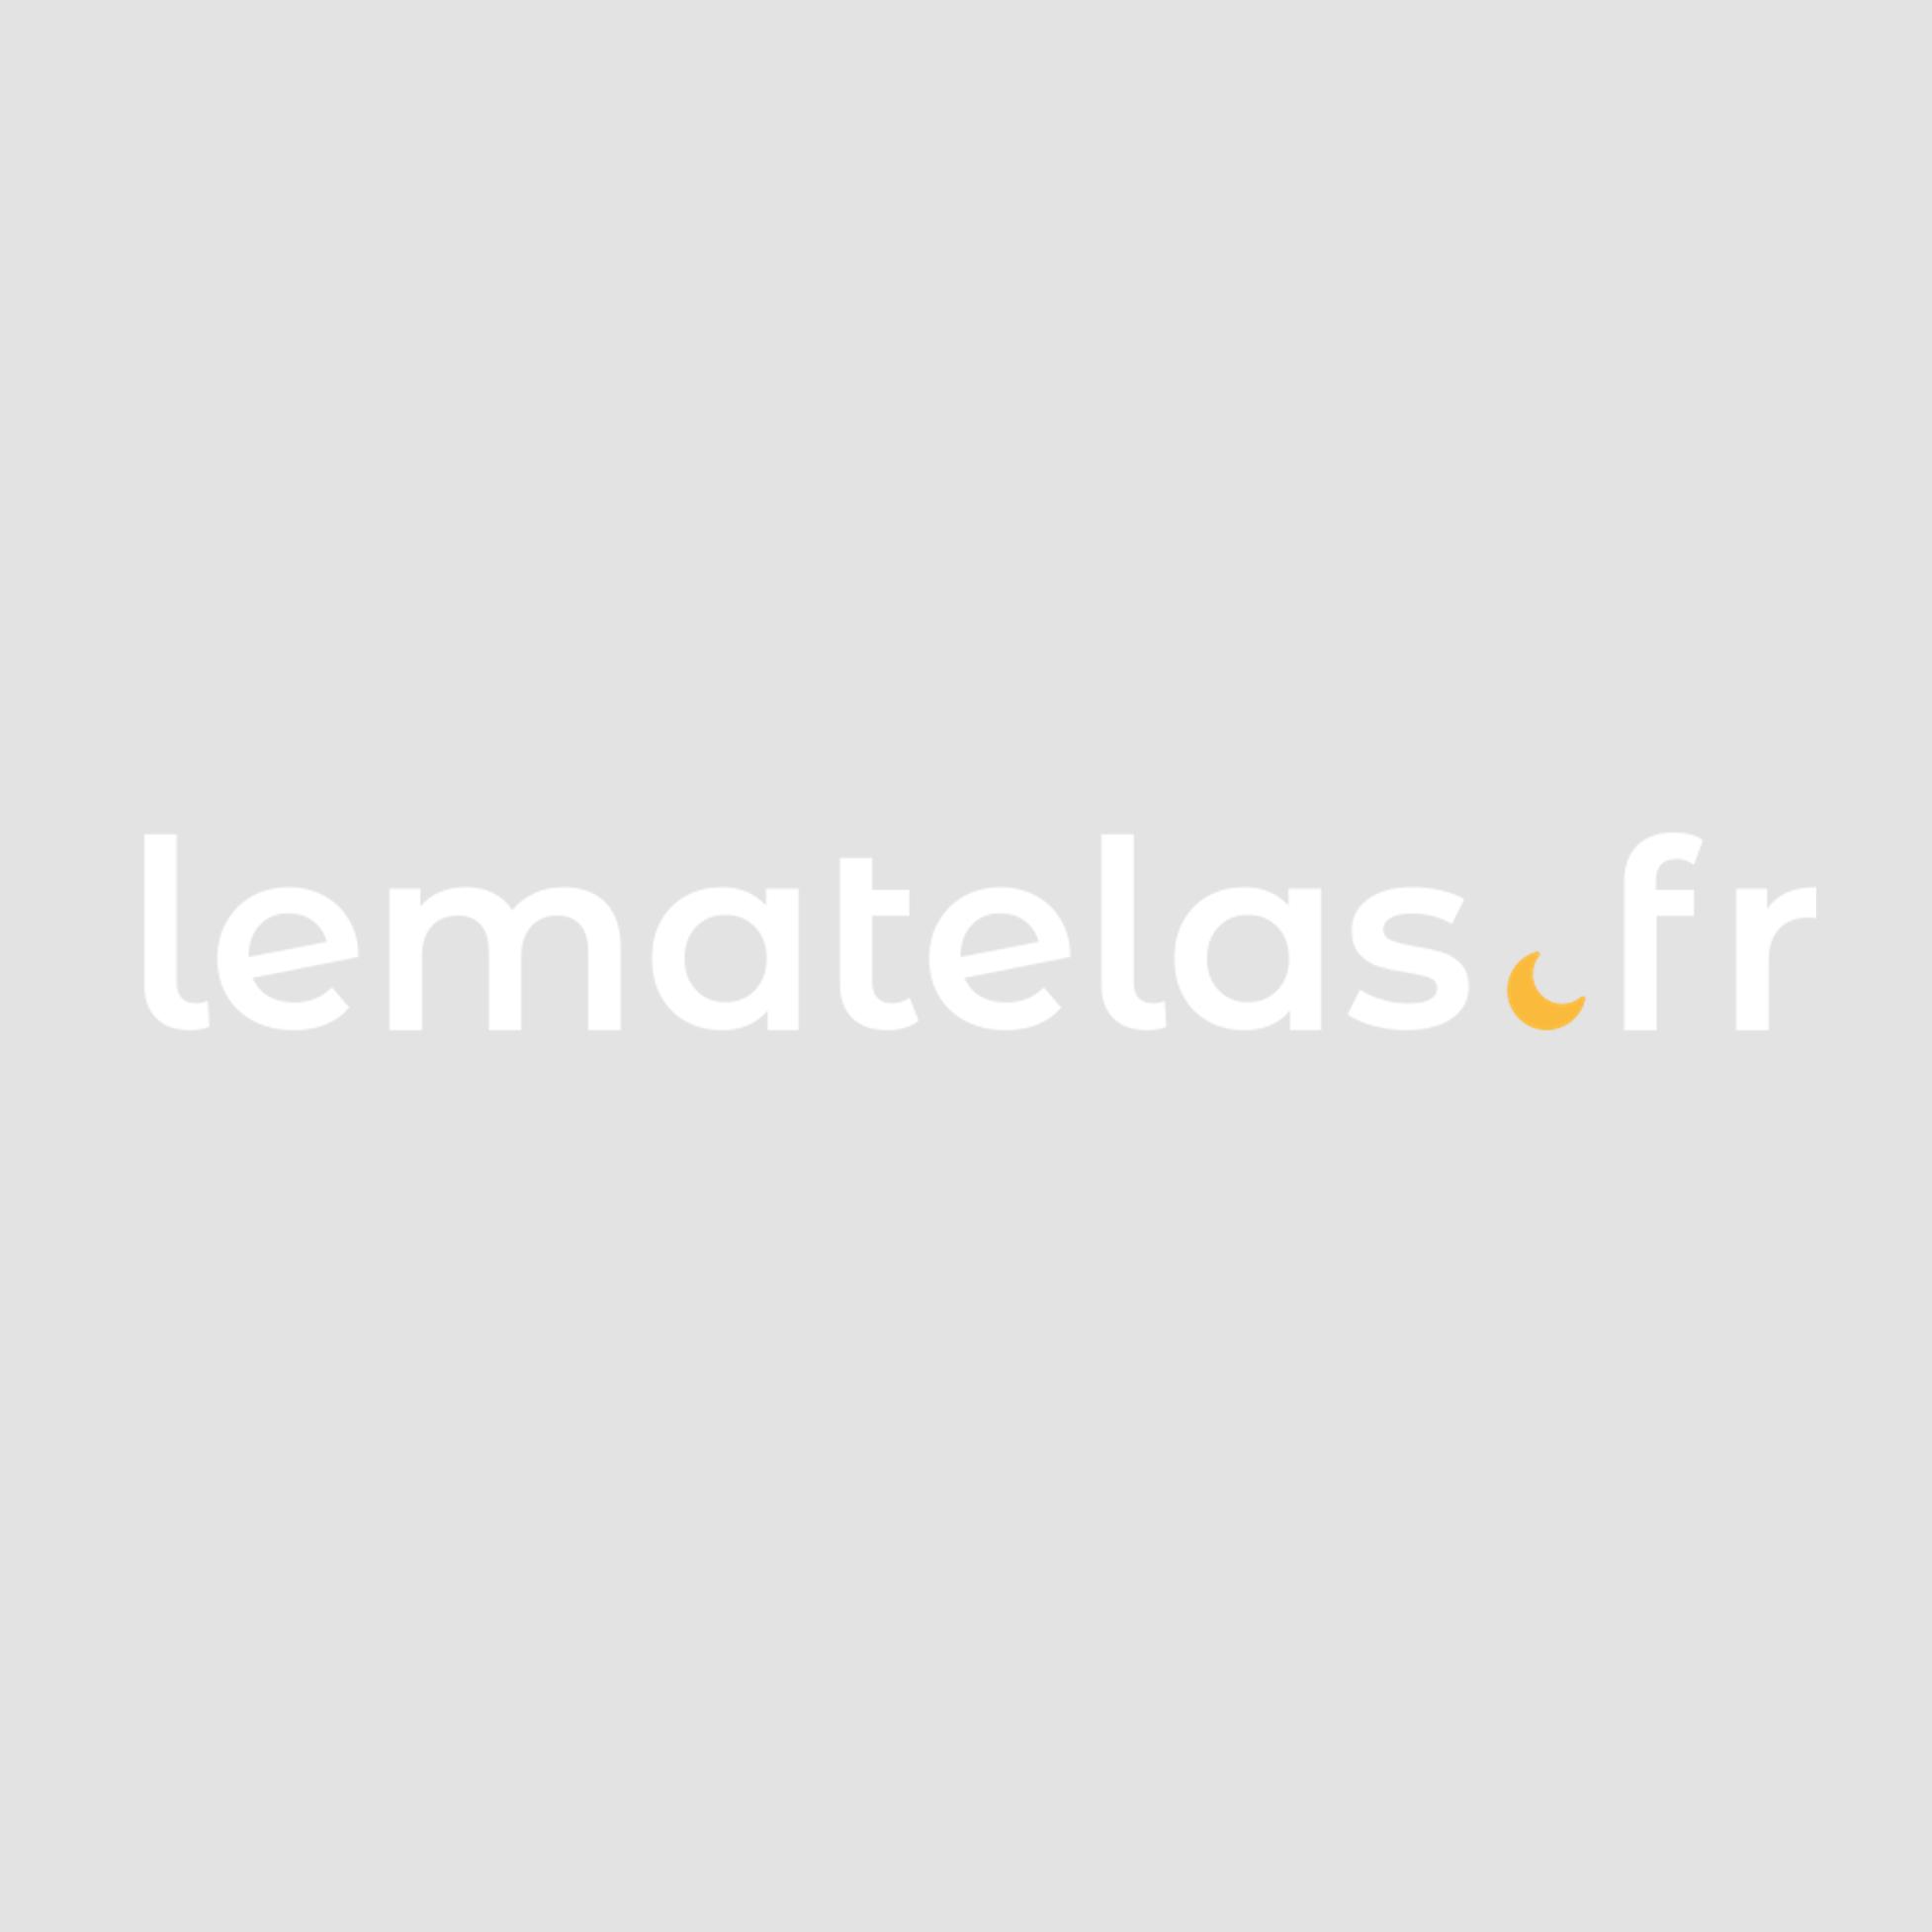 Bureau Noir Et Blanc bureau noir et blanc en bois avec rangement - bu4014